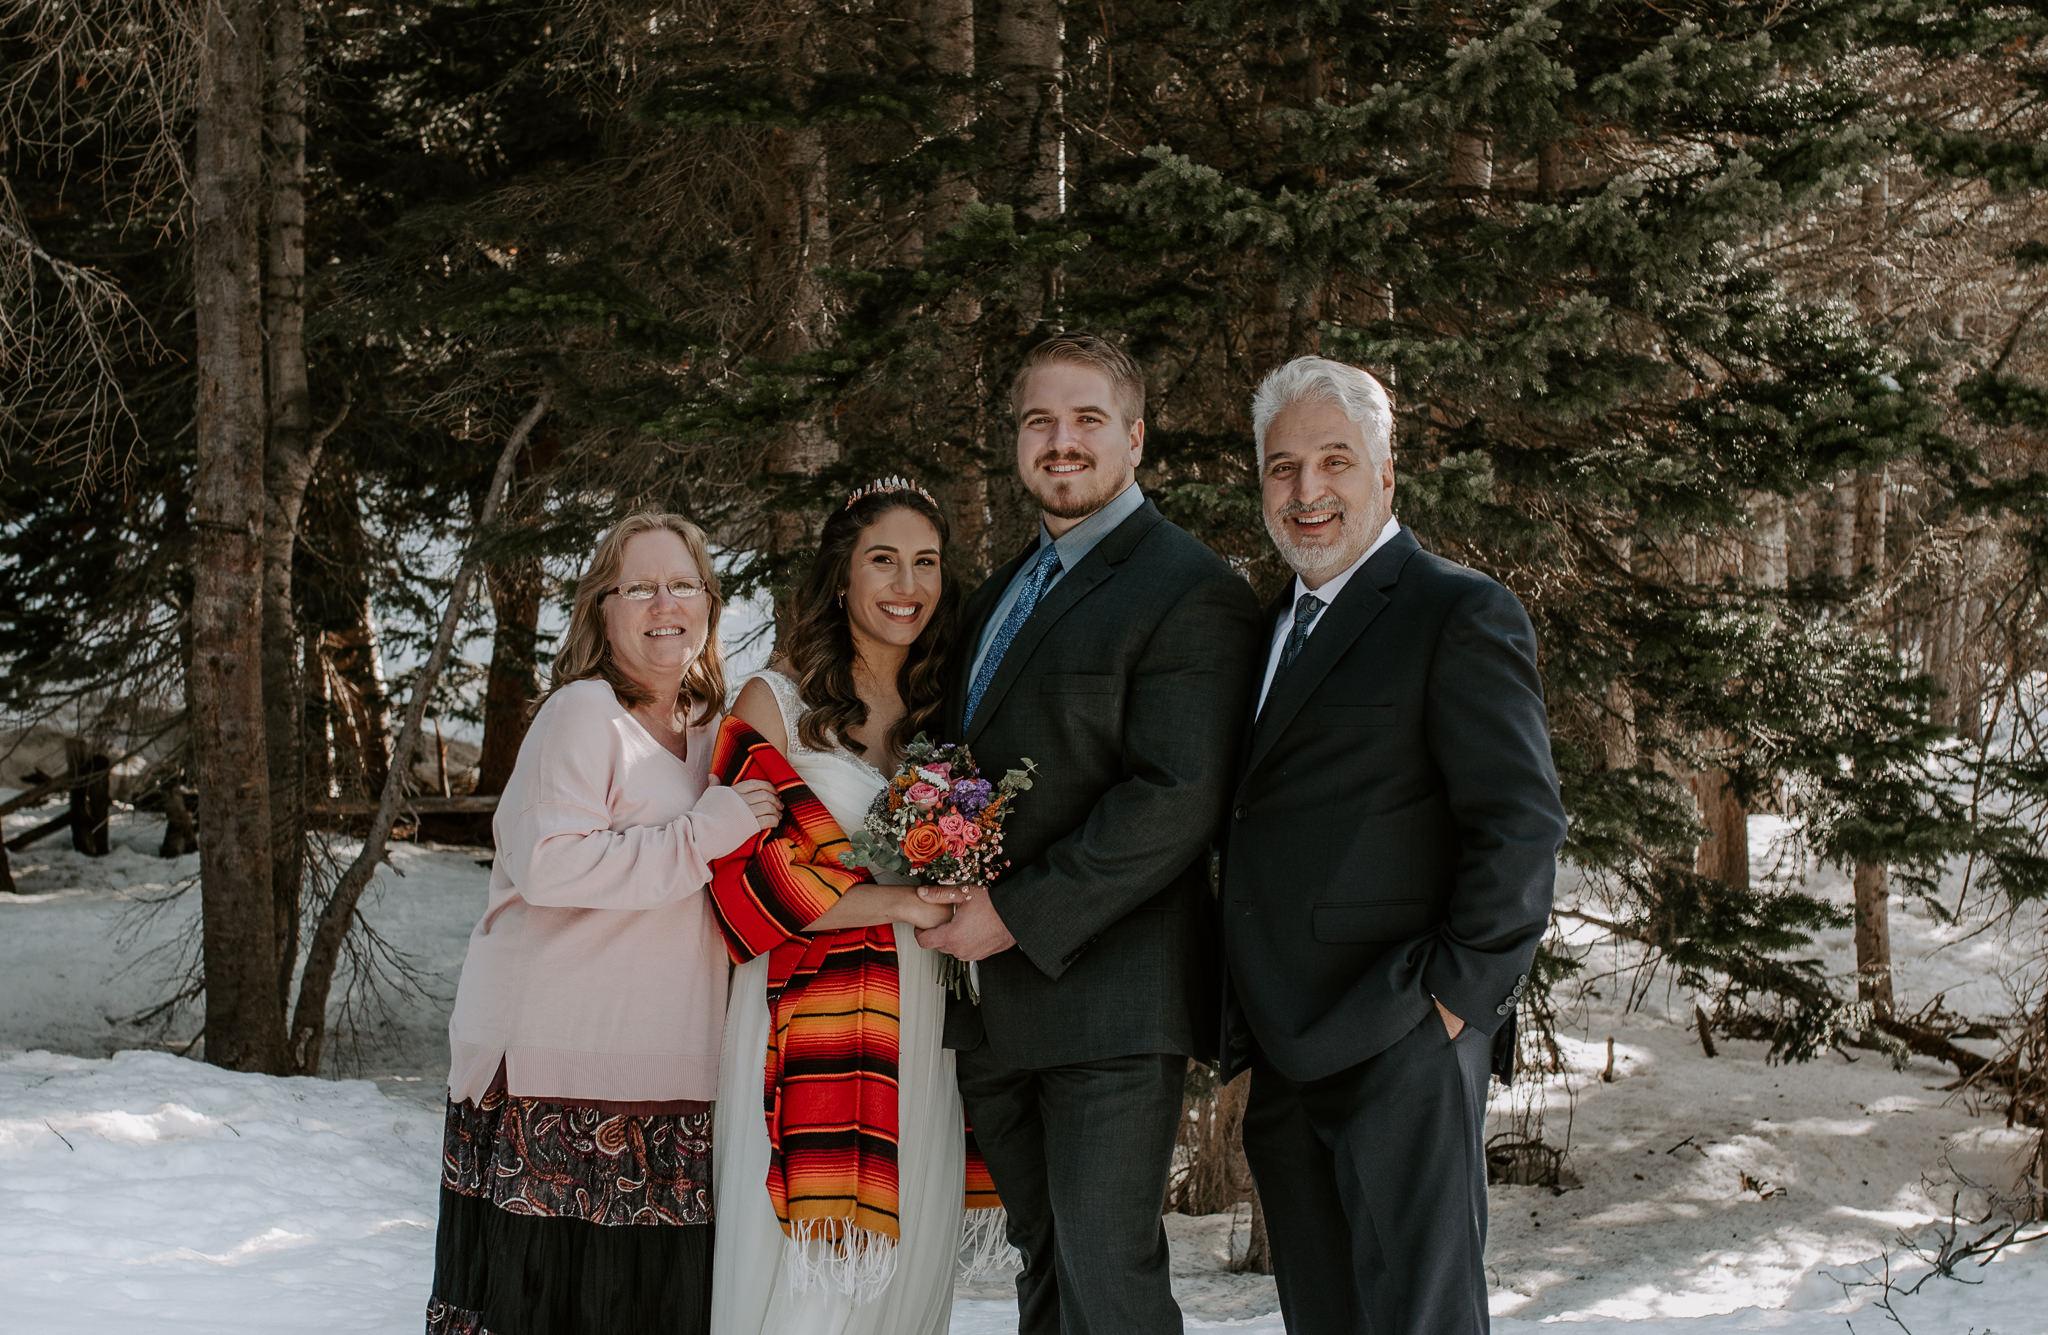 Colorado adventure elopement and wedding photographer